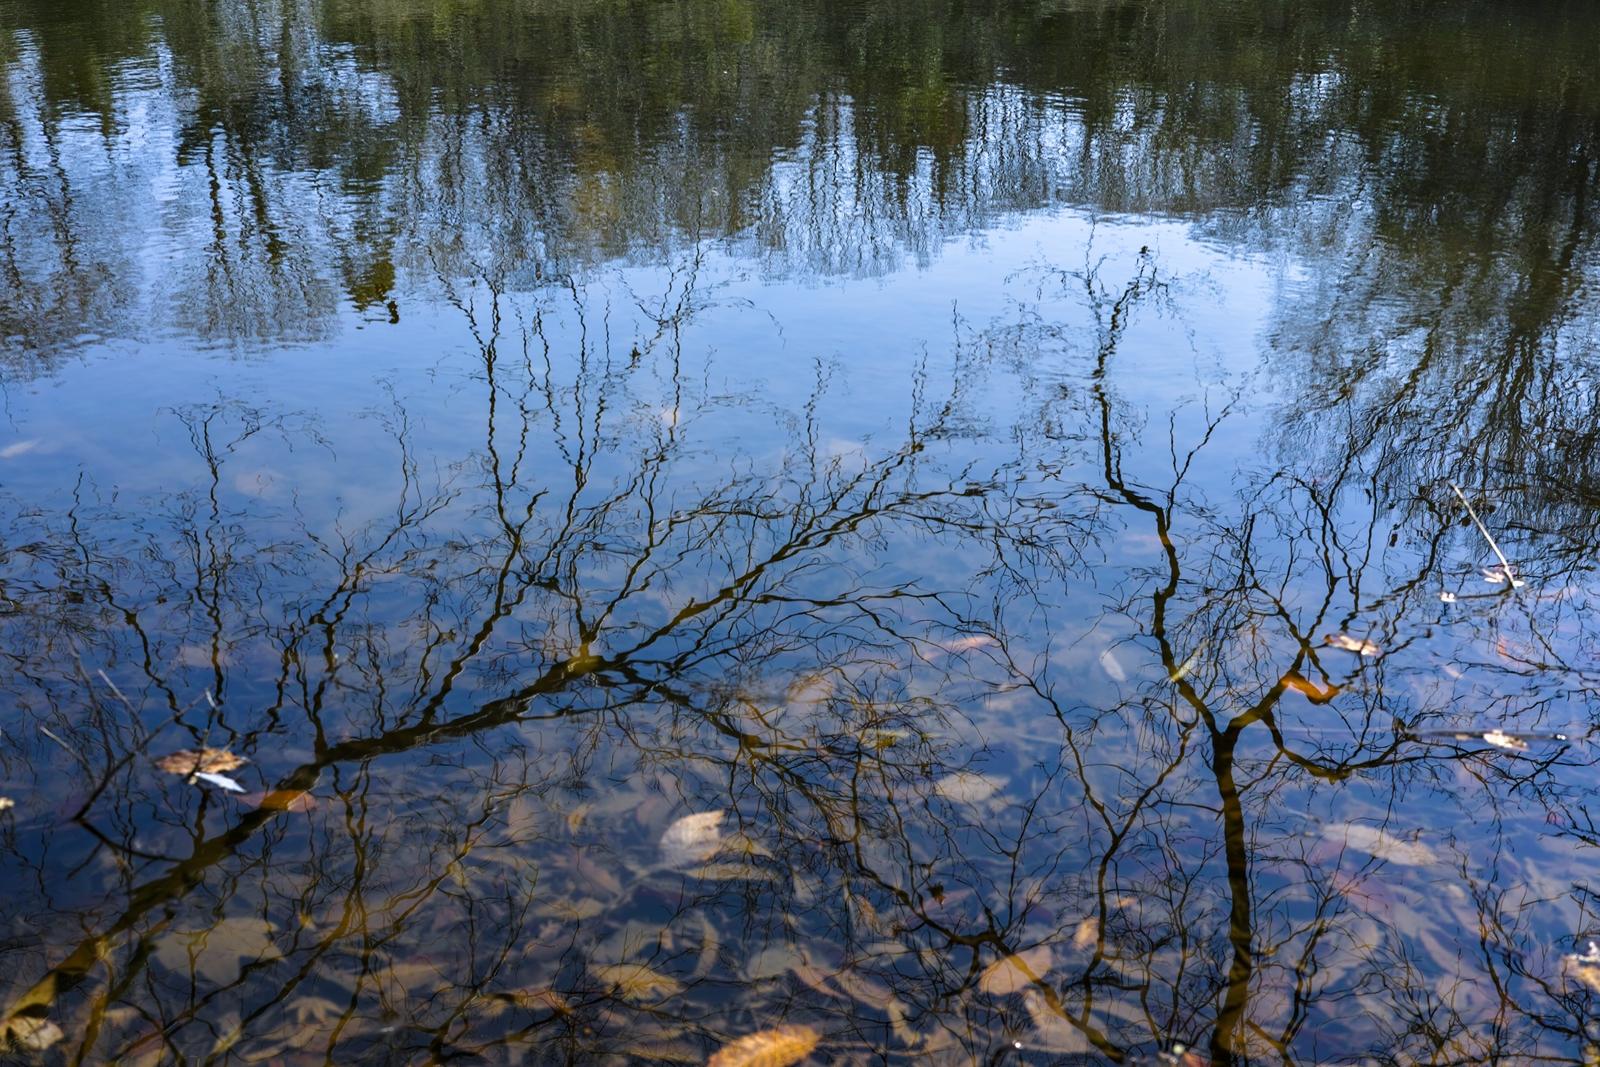 Photo: 「巡る」 / Life cycle.  巡る巡る 永久の旅 またあの場所へ 青い青い 空へと向かって  SIGMA DP2 Merrill #SIGMA #DP2 #Merrill #Foveon  #landscapephotography  ( http://takafumiooshio.com/archives/822 )